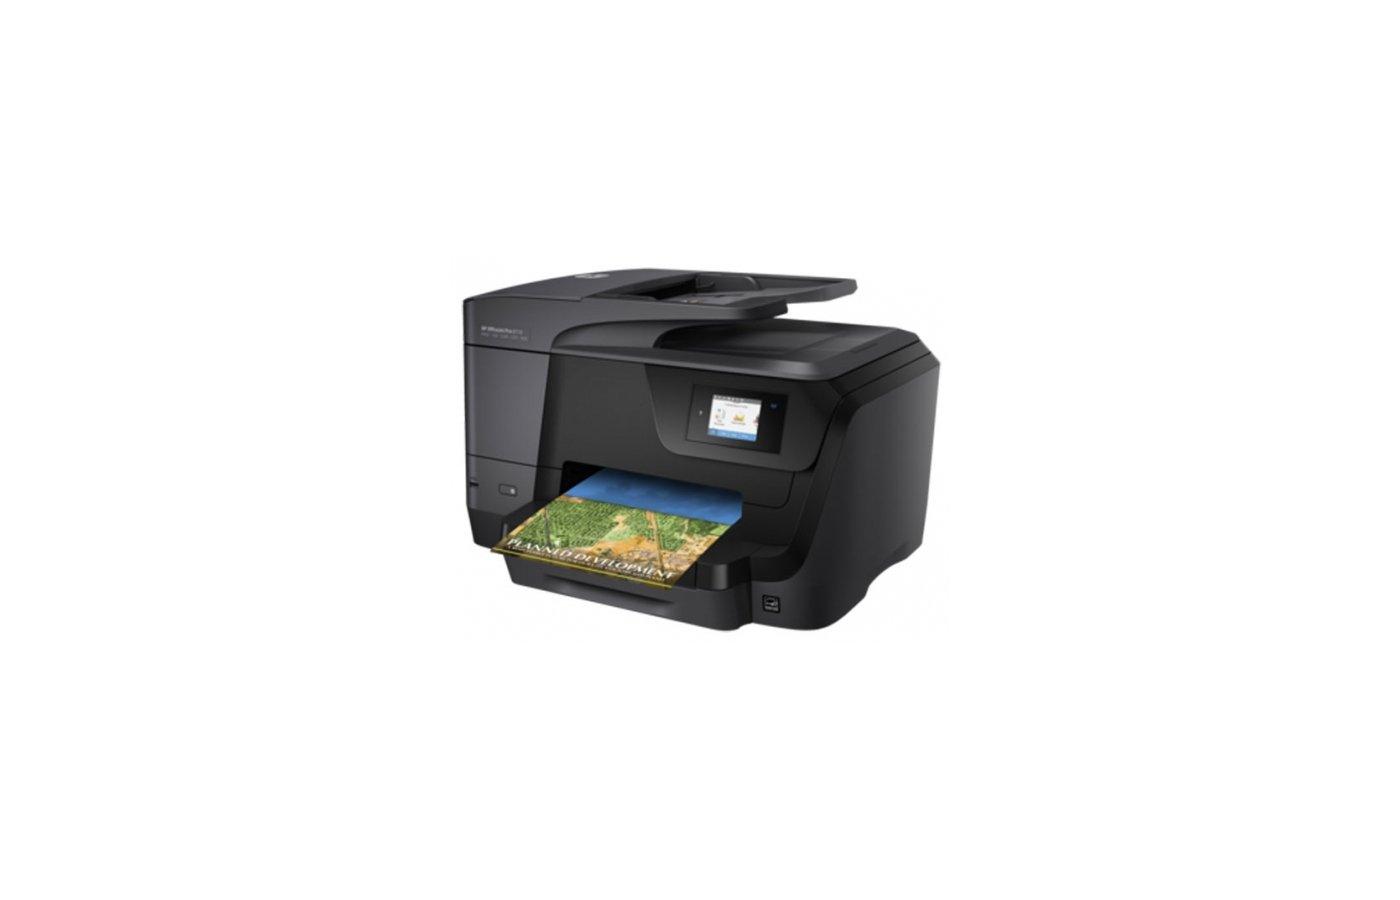 МФУ HP OfficeJet Pro 8710 e-AiO /D9L18A/